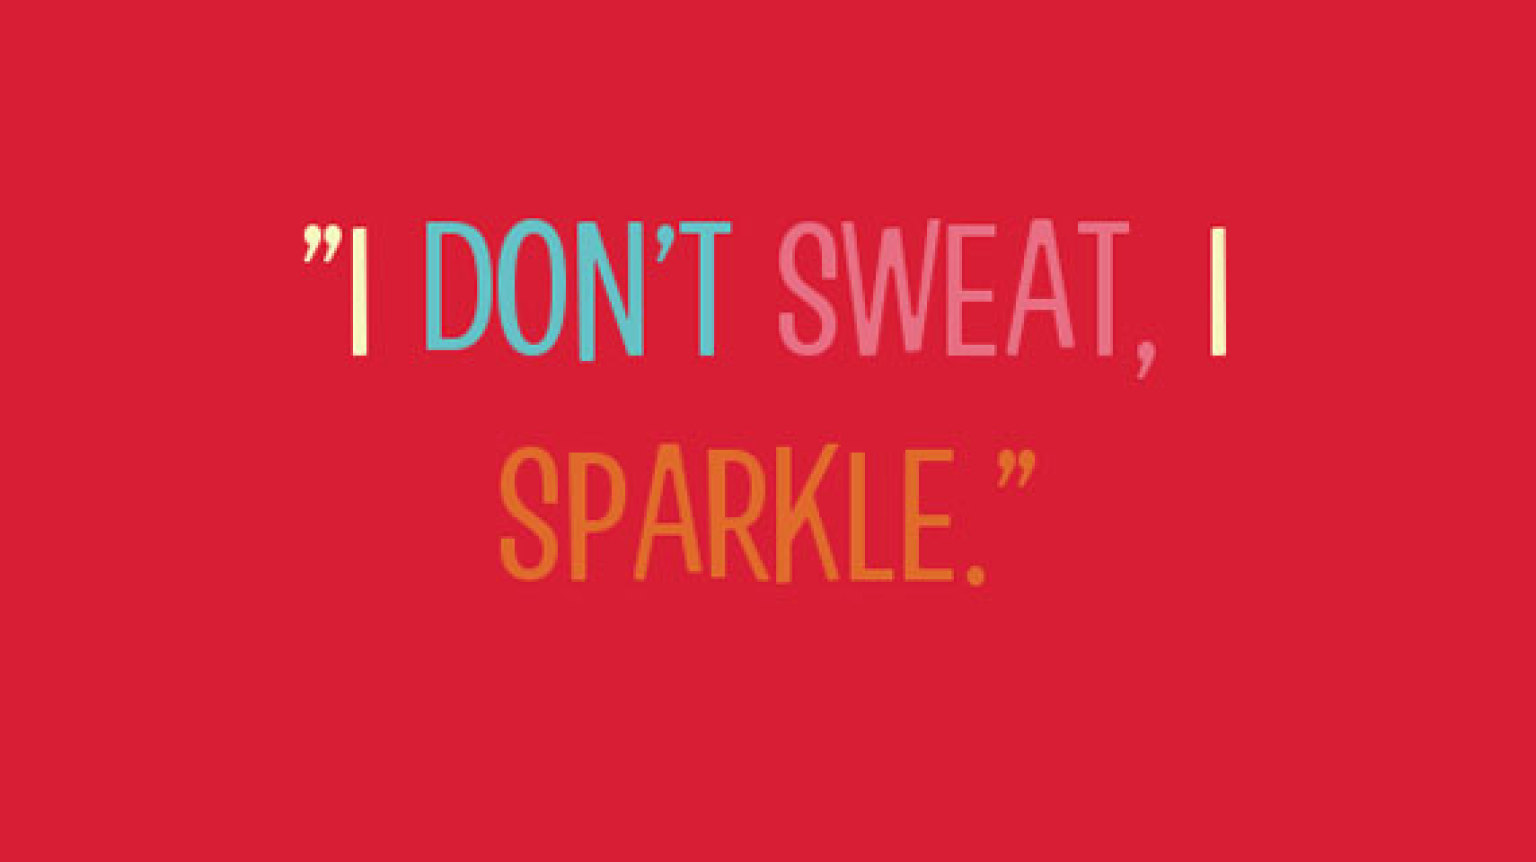 Pics photos funny fitness slogans